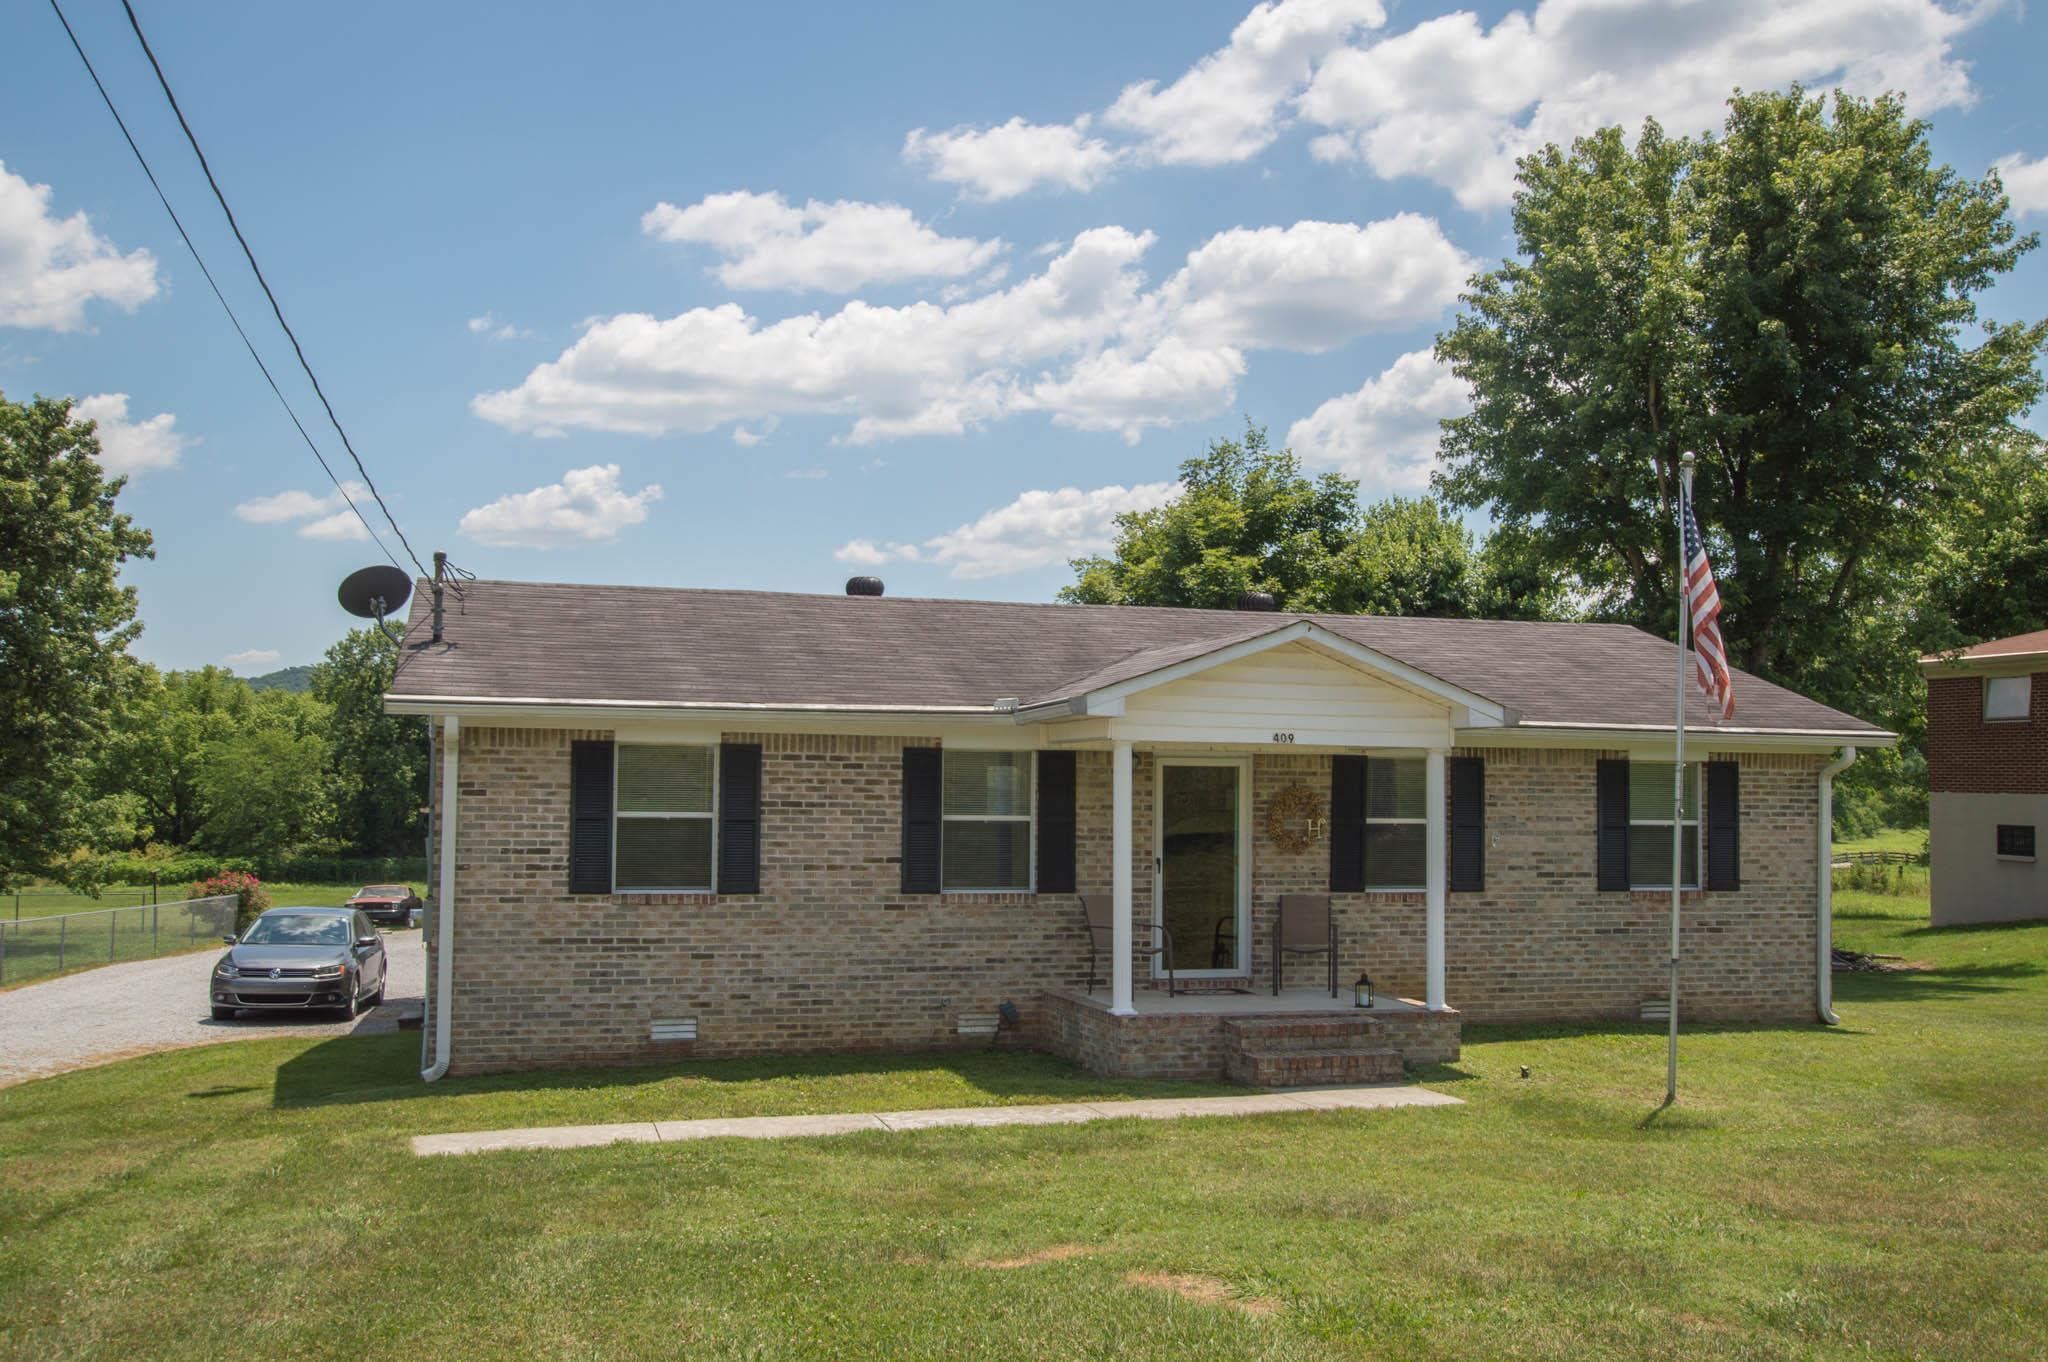 409 Murfreesboro Rd, Woodbury, TN 37190